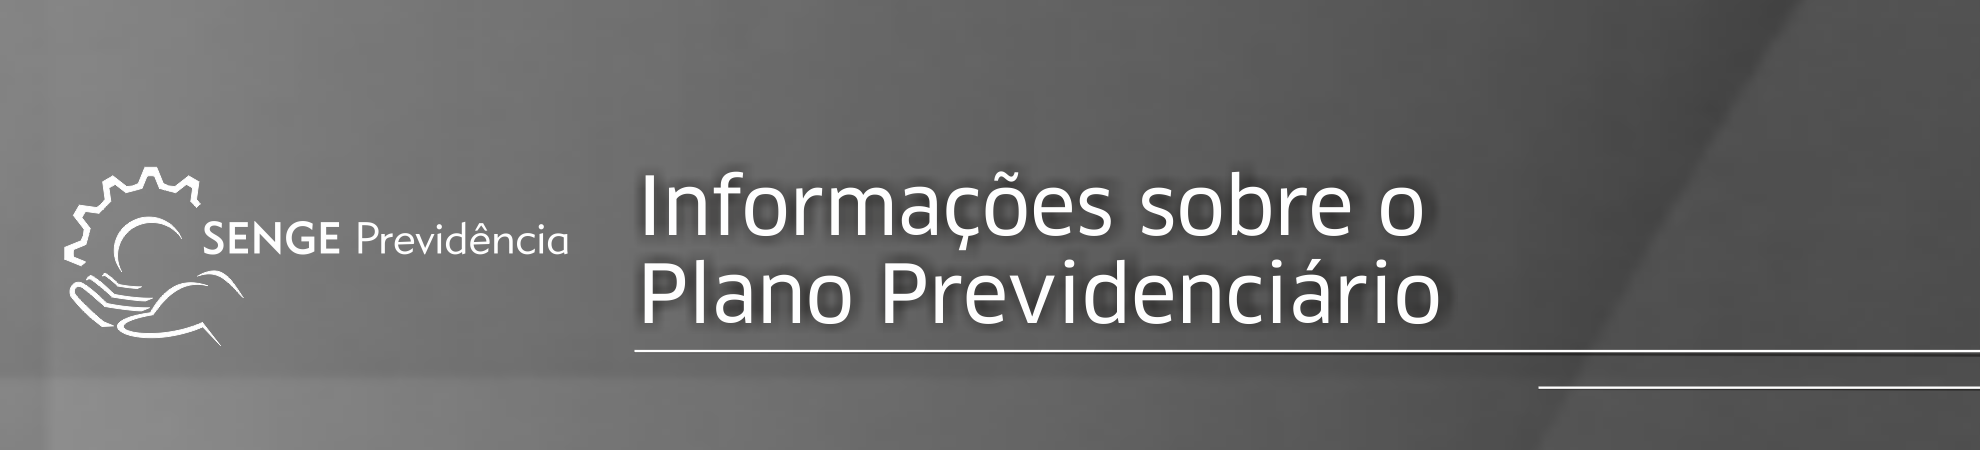 cabecalho_informacoes_senge